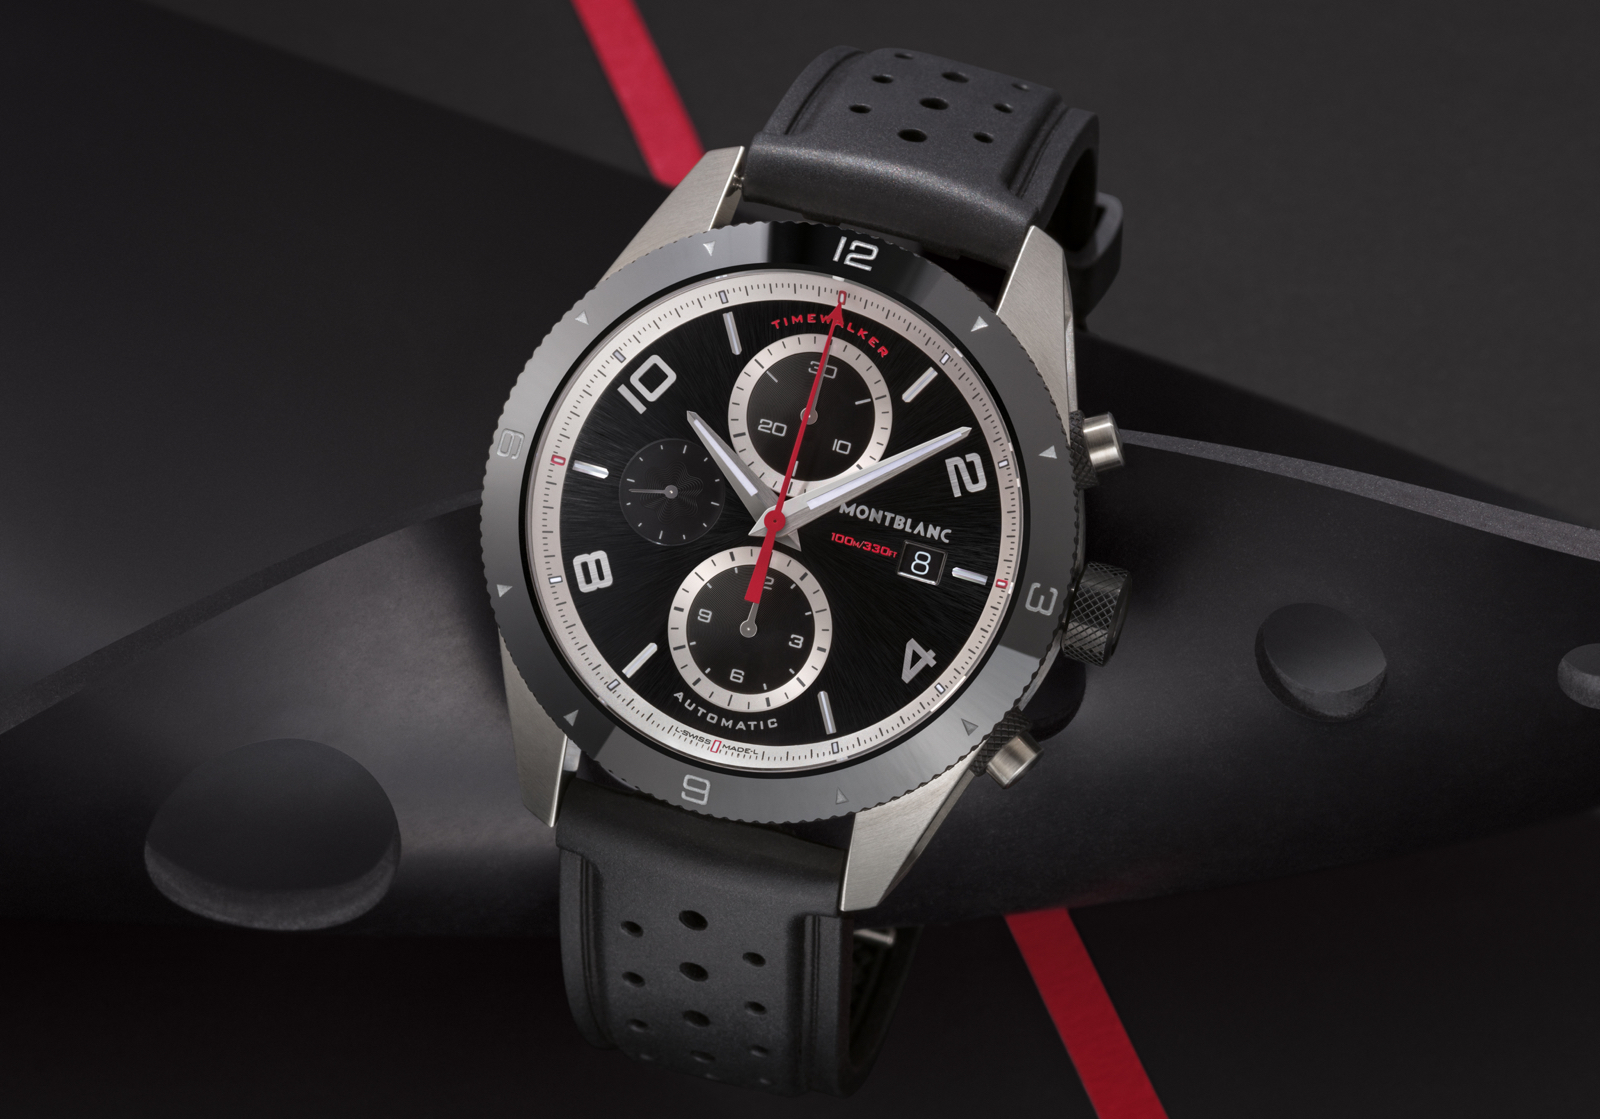 Montblanc SIHH 2017 TimeWalker Chronograph